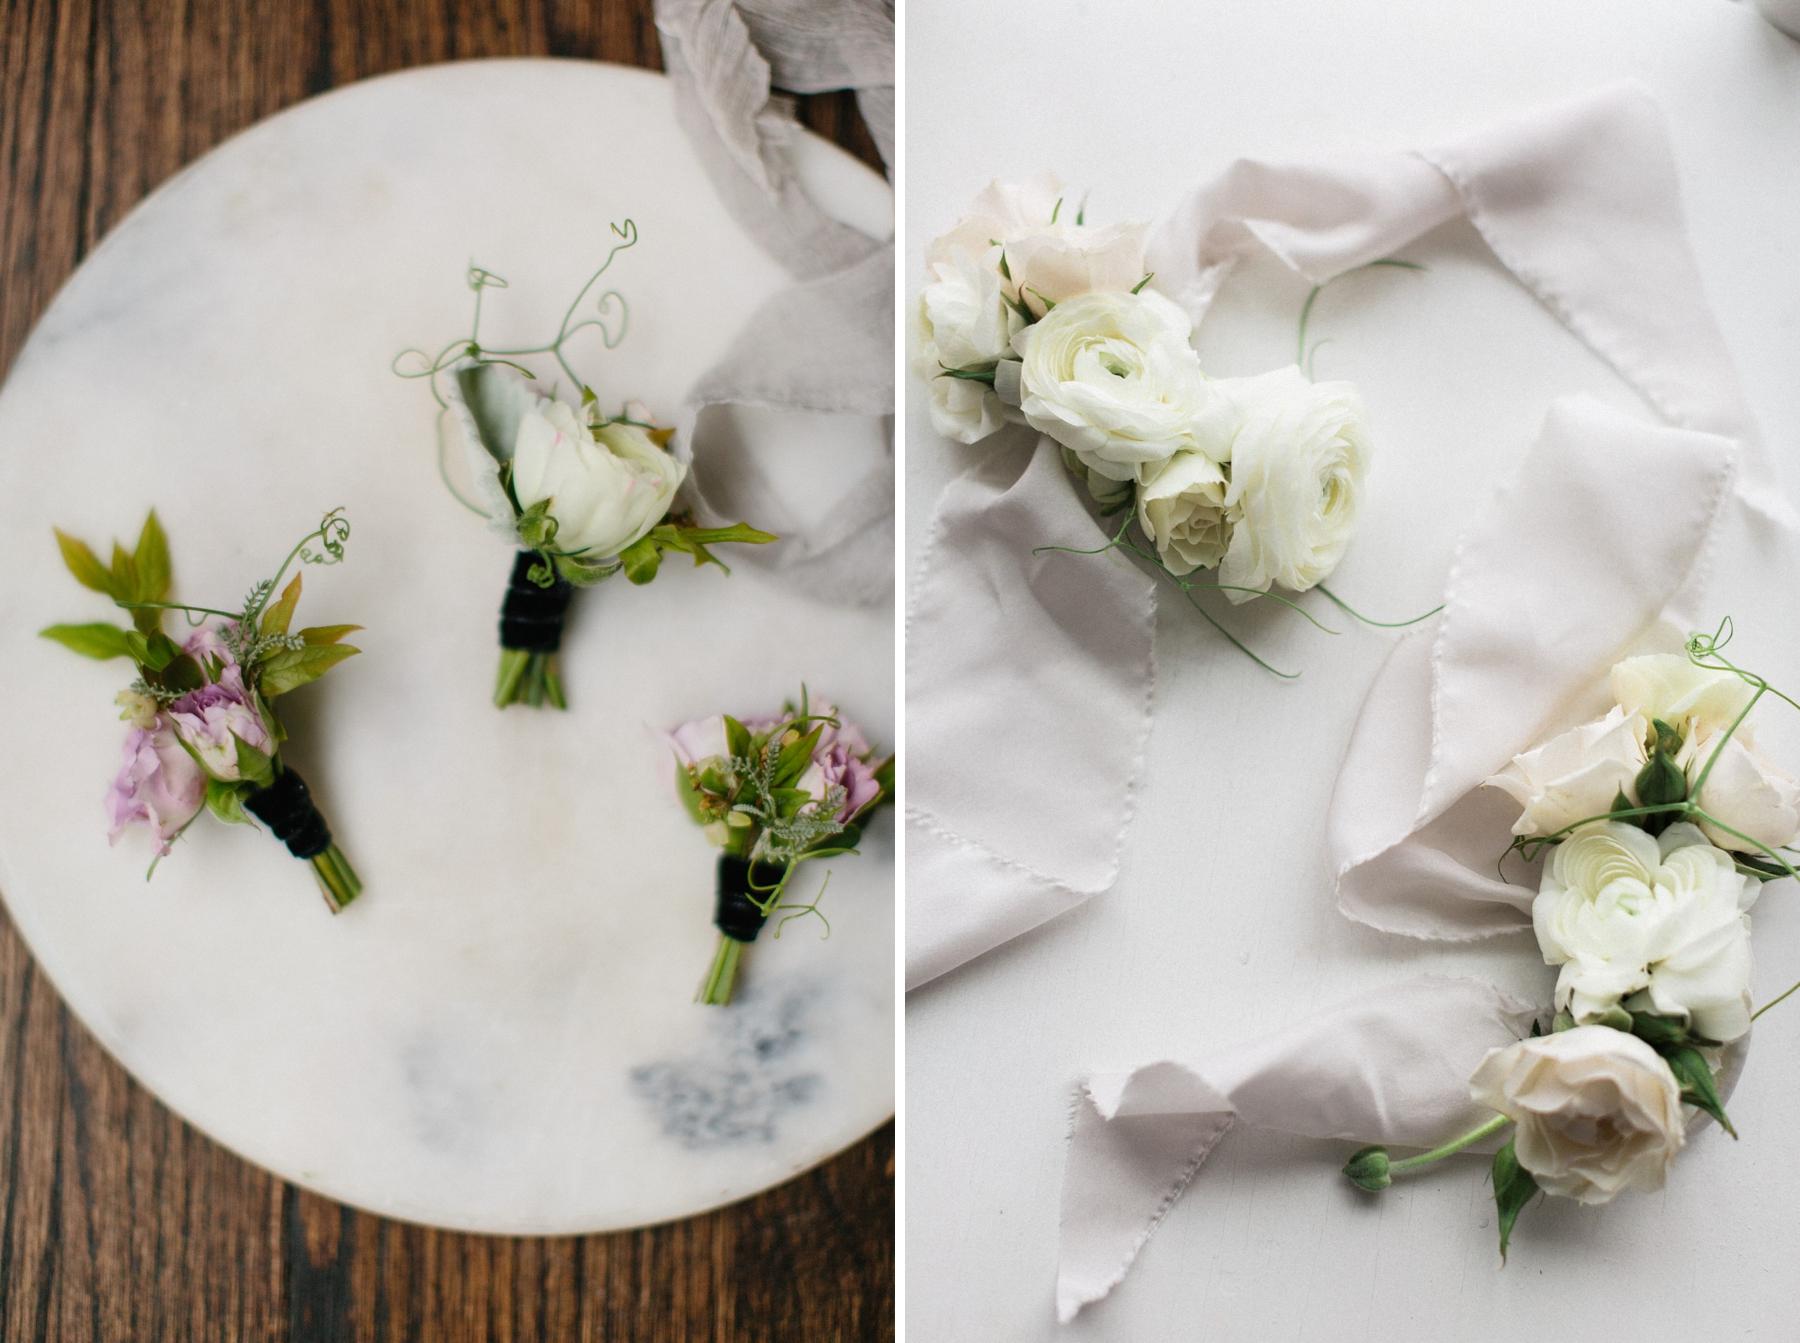 ranunculus corsages for wedding